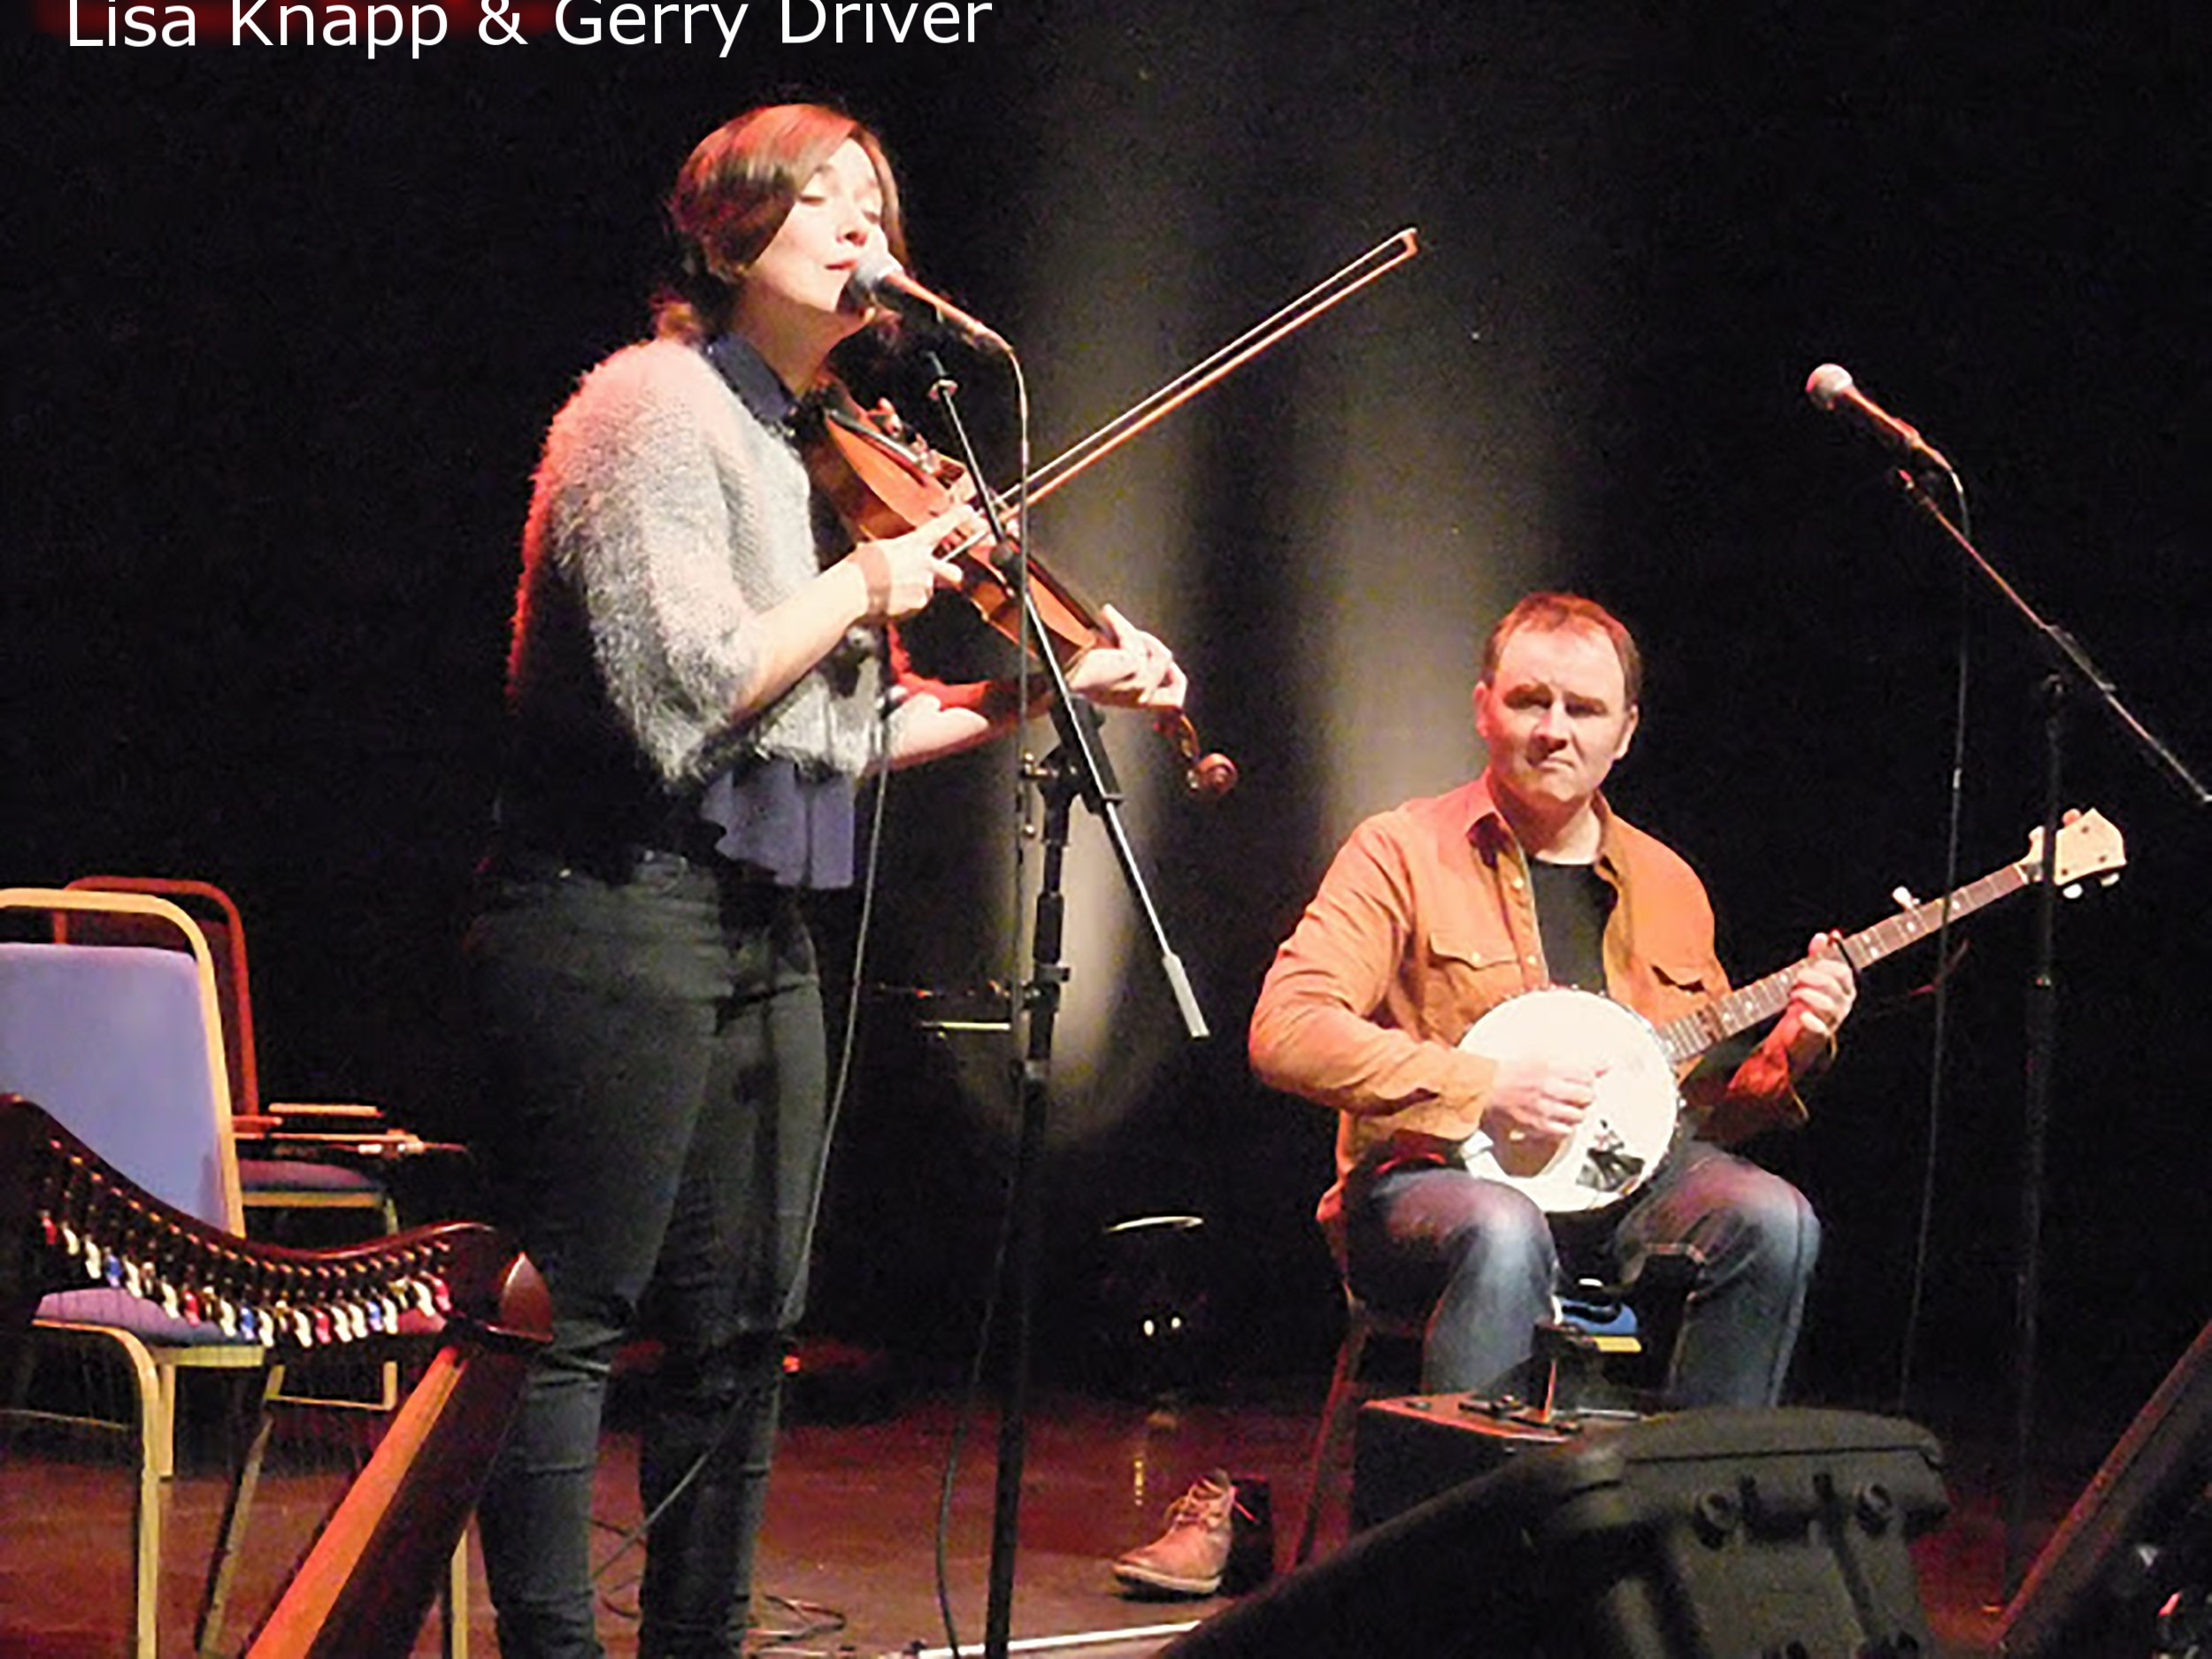 Copy of Lisa Knapp & Gerry Driver